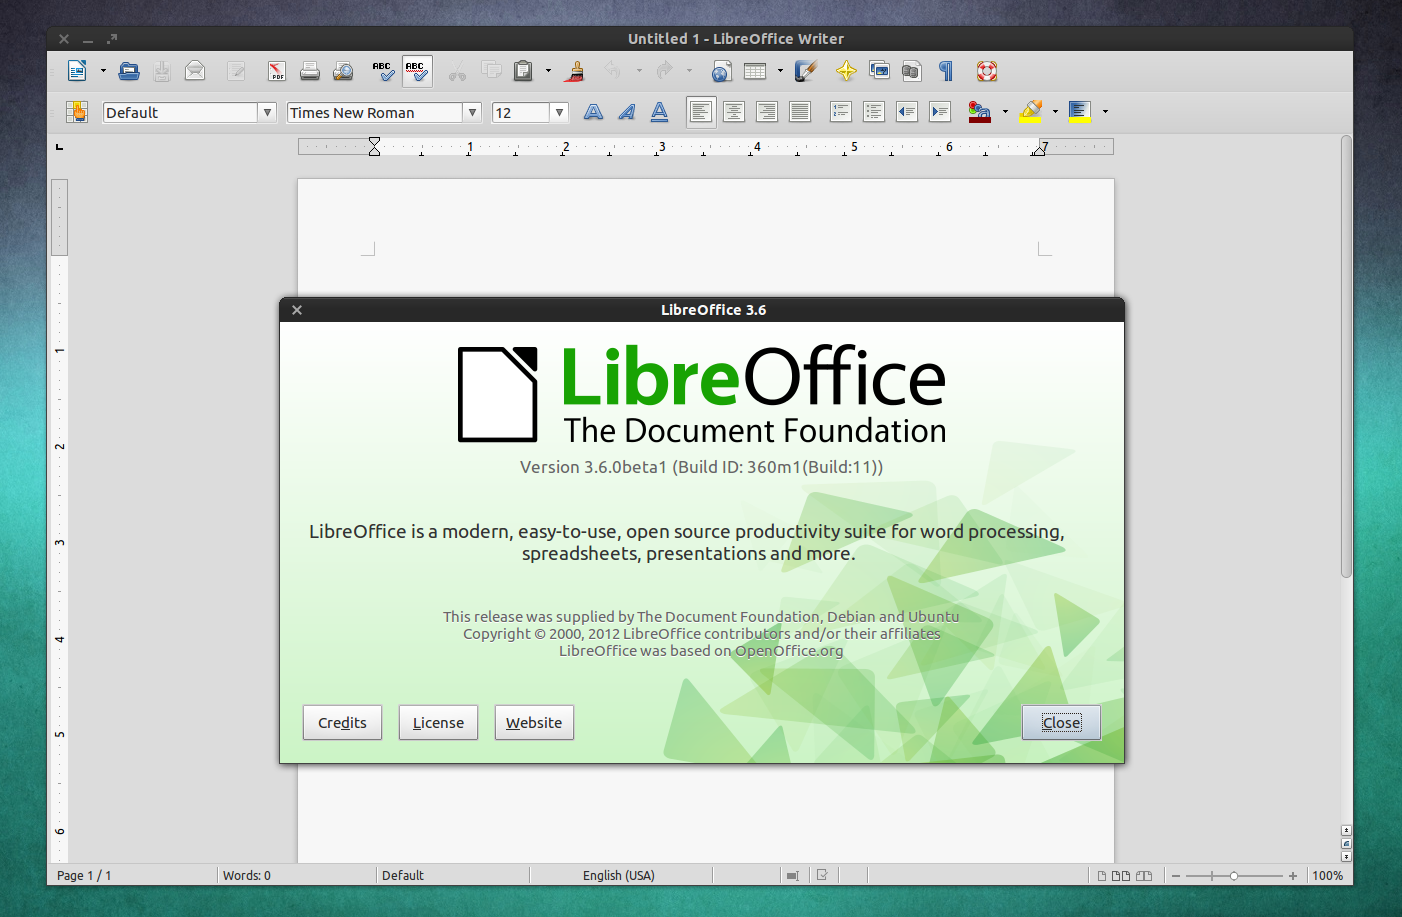 Libreoffice 3 6 0 beta 1 released ubuntu ppa - Open office vs office libre ...